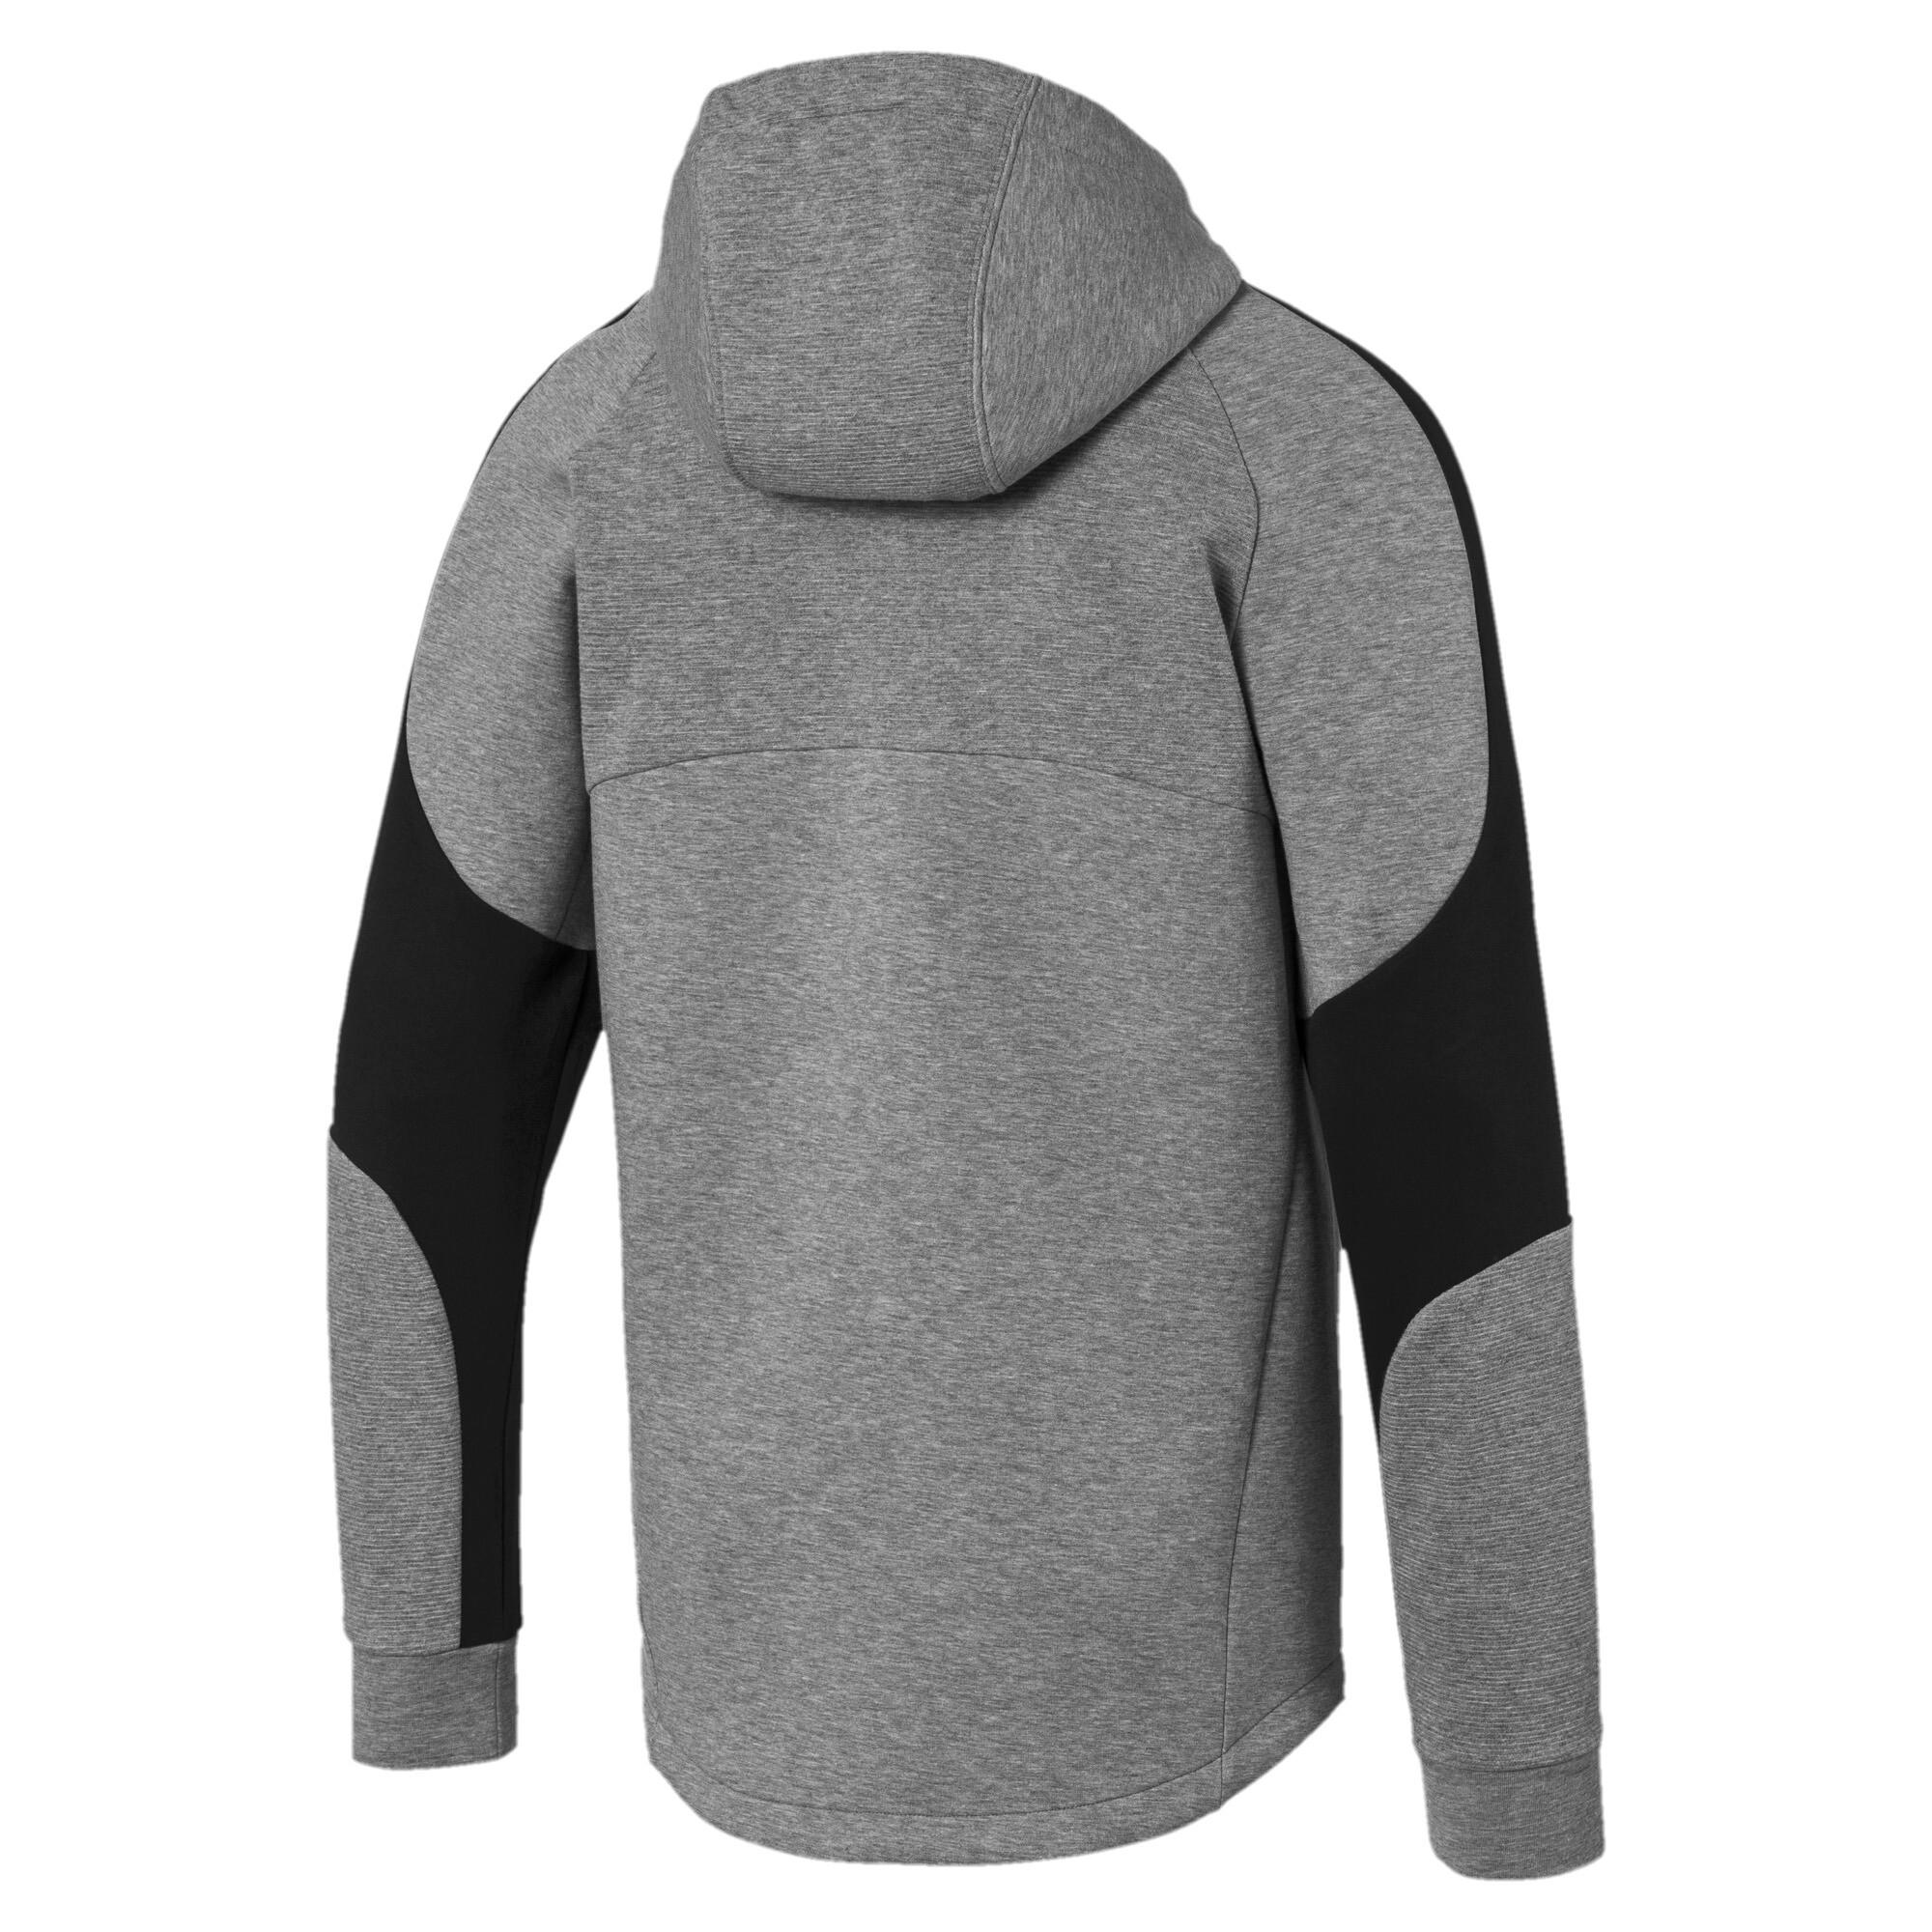 PUMA-Evostripe-Men-039-s-Full-Zip-Hoodie-Men-Sweat-Basics thumbnail 13